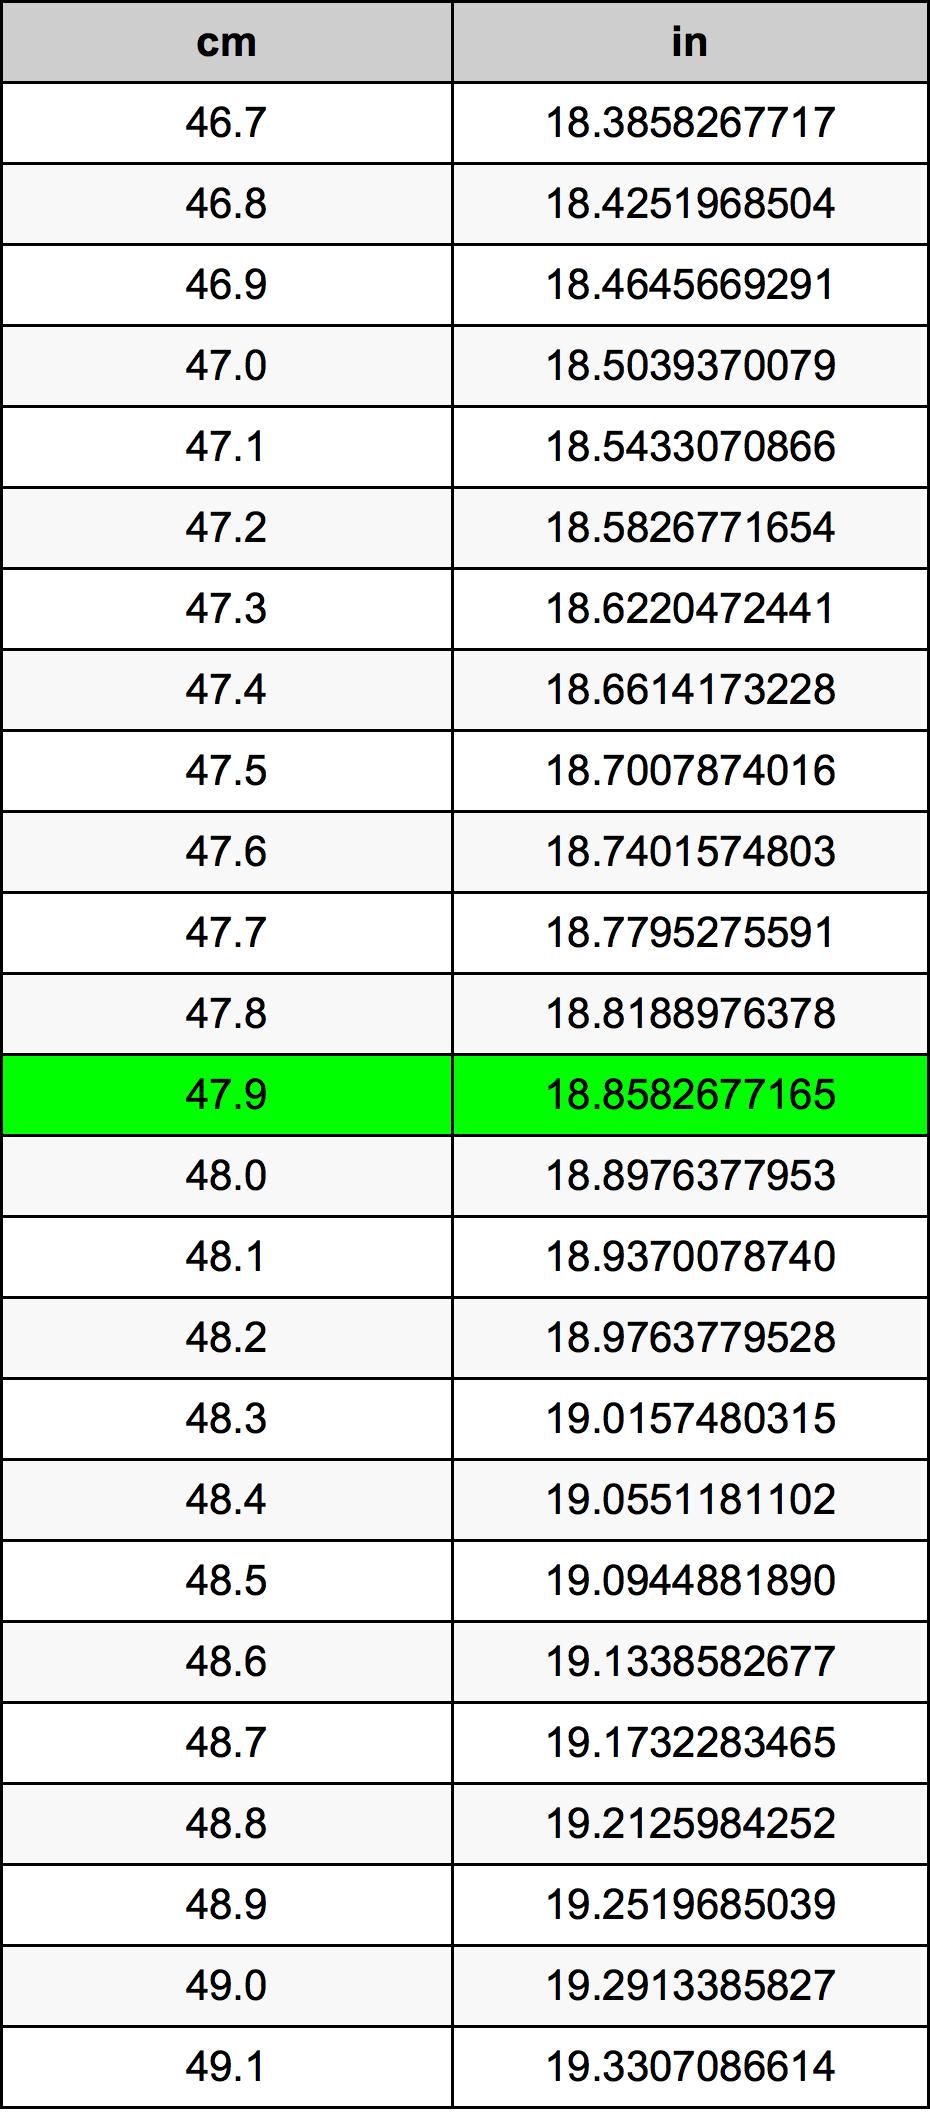 47.9 Centimeter konverteringstabellen